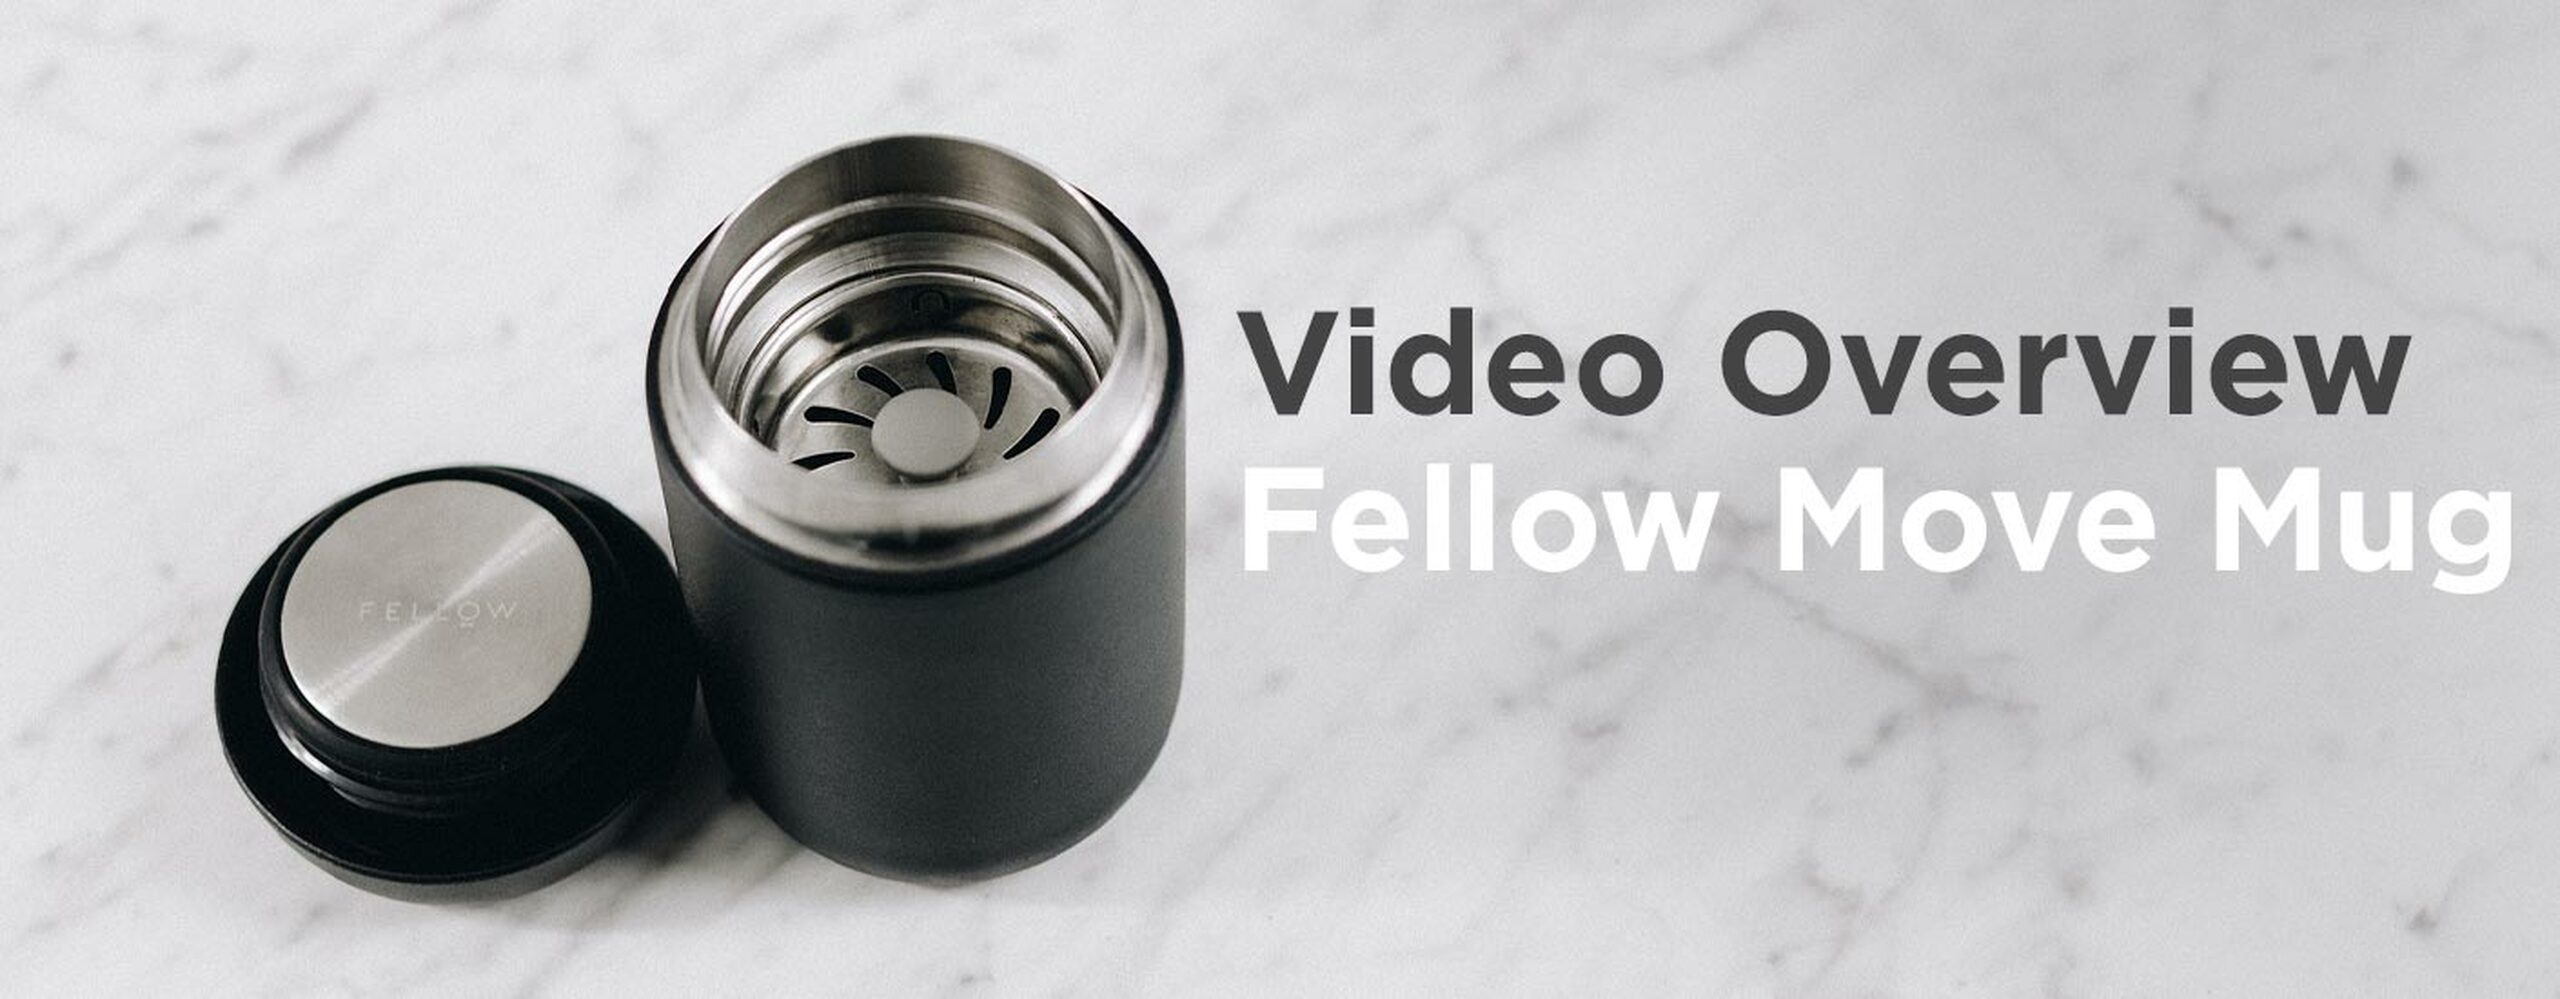 Fellow Move Mug Overview